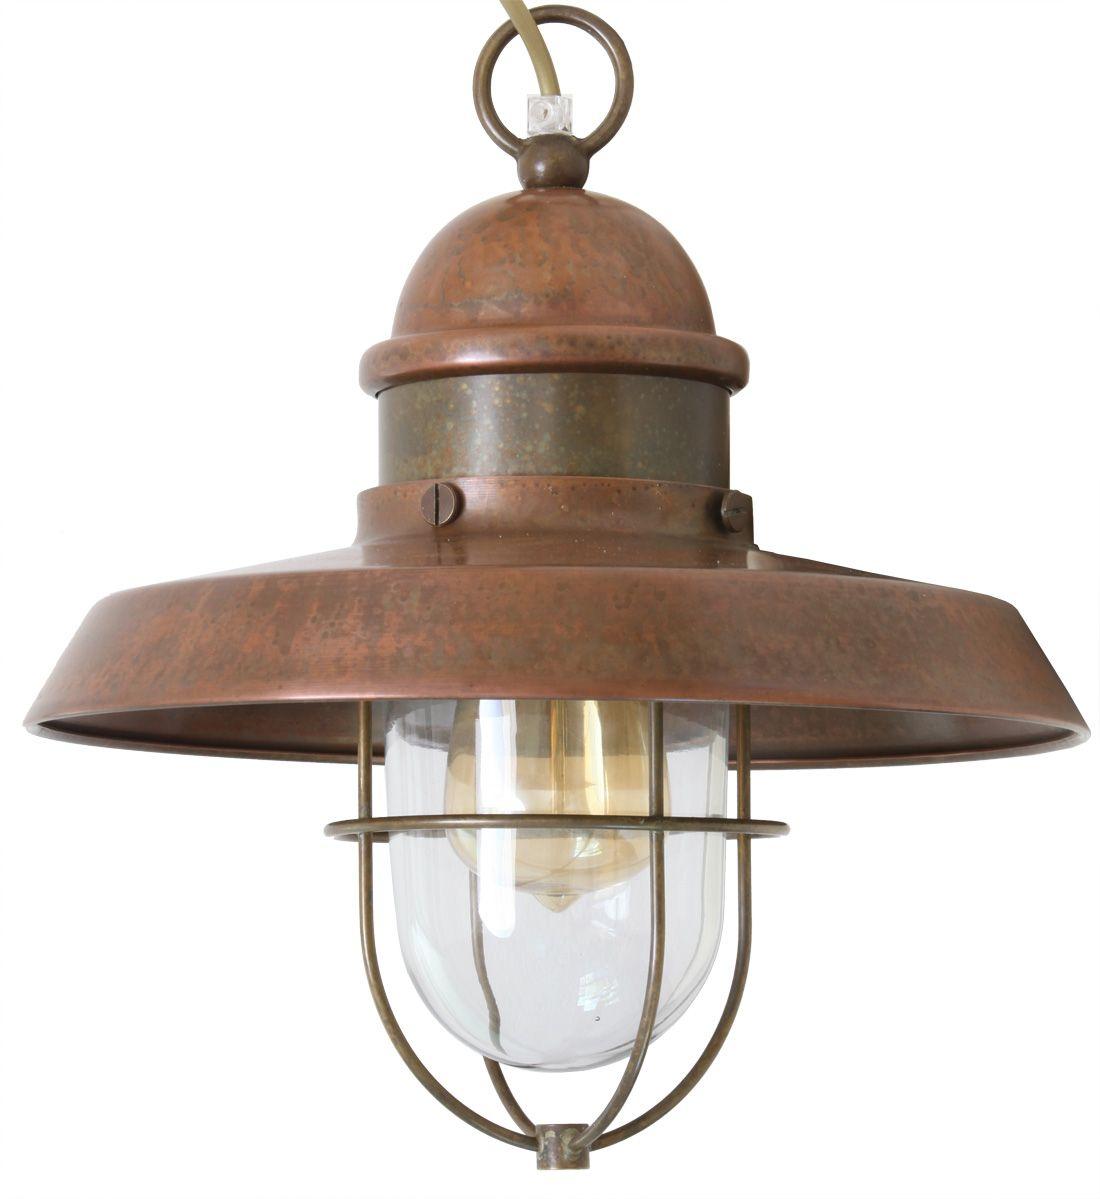 Maritime Outdoor Pendant Lamp Il Patio 225 07 Or By Italienische Hofleuchten Venezianisches Glas Pendelleuchte Aussenlampe